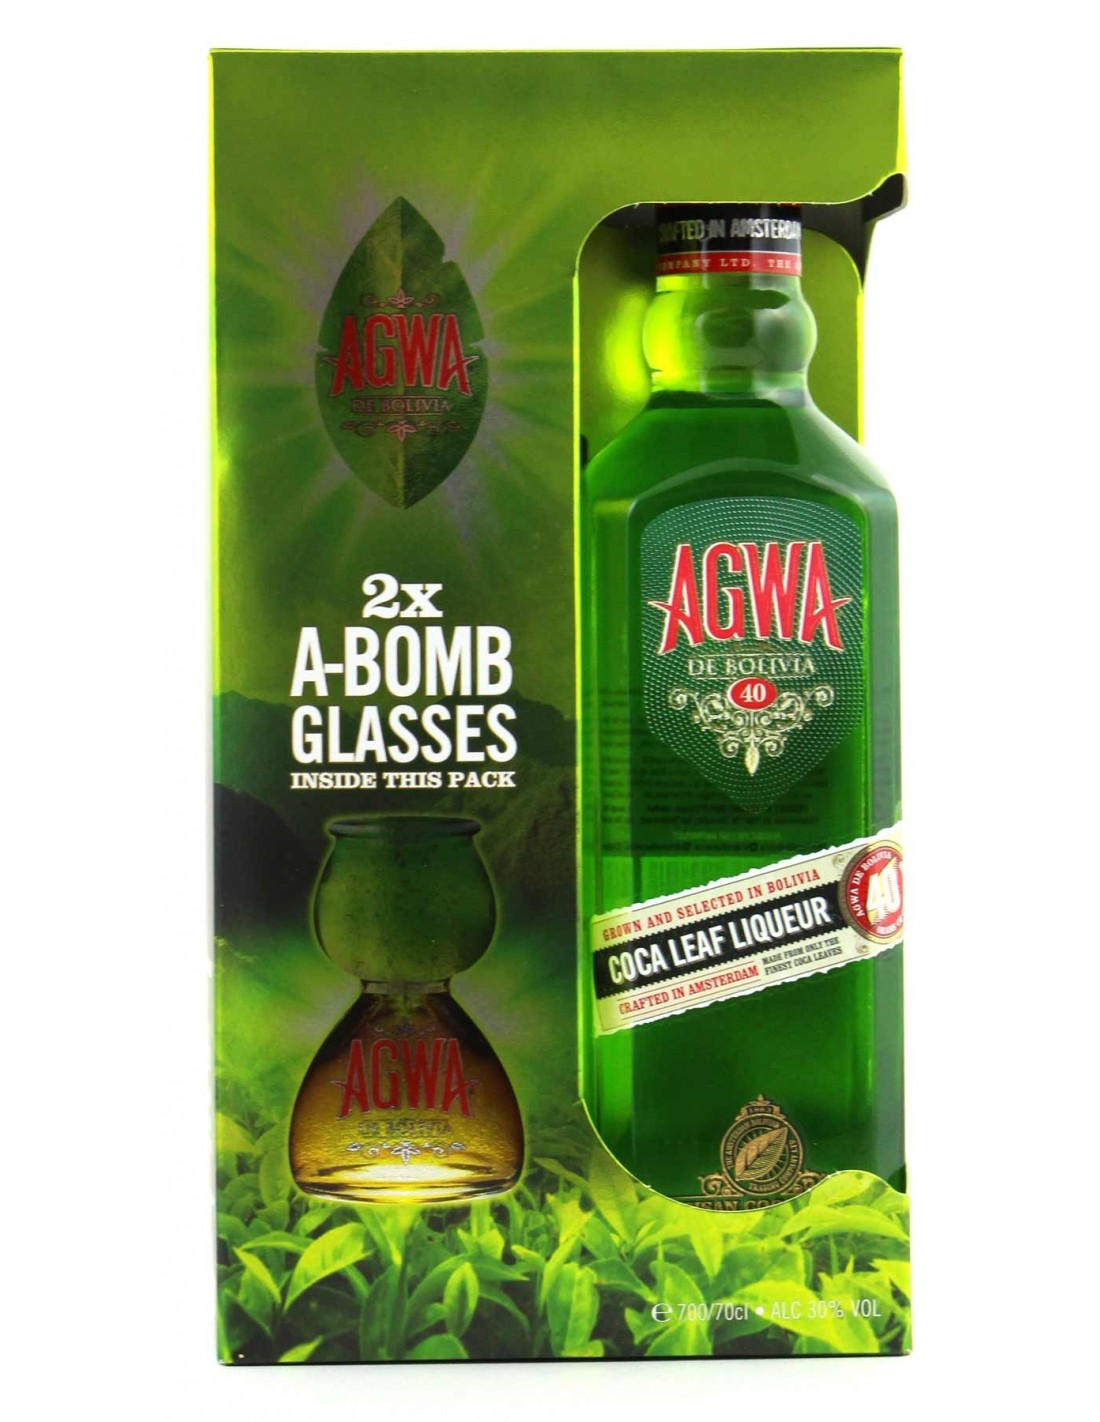 Lichior AGWA DE BOLIVIA + 2 GLASSES 0.7L